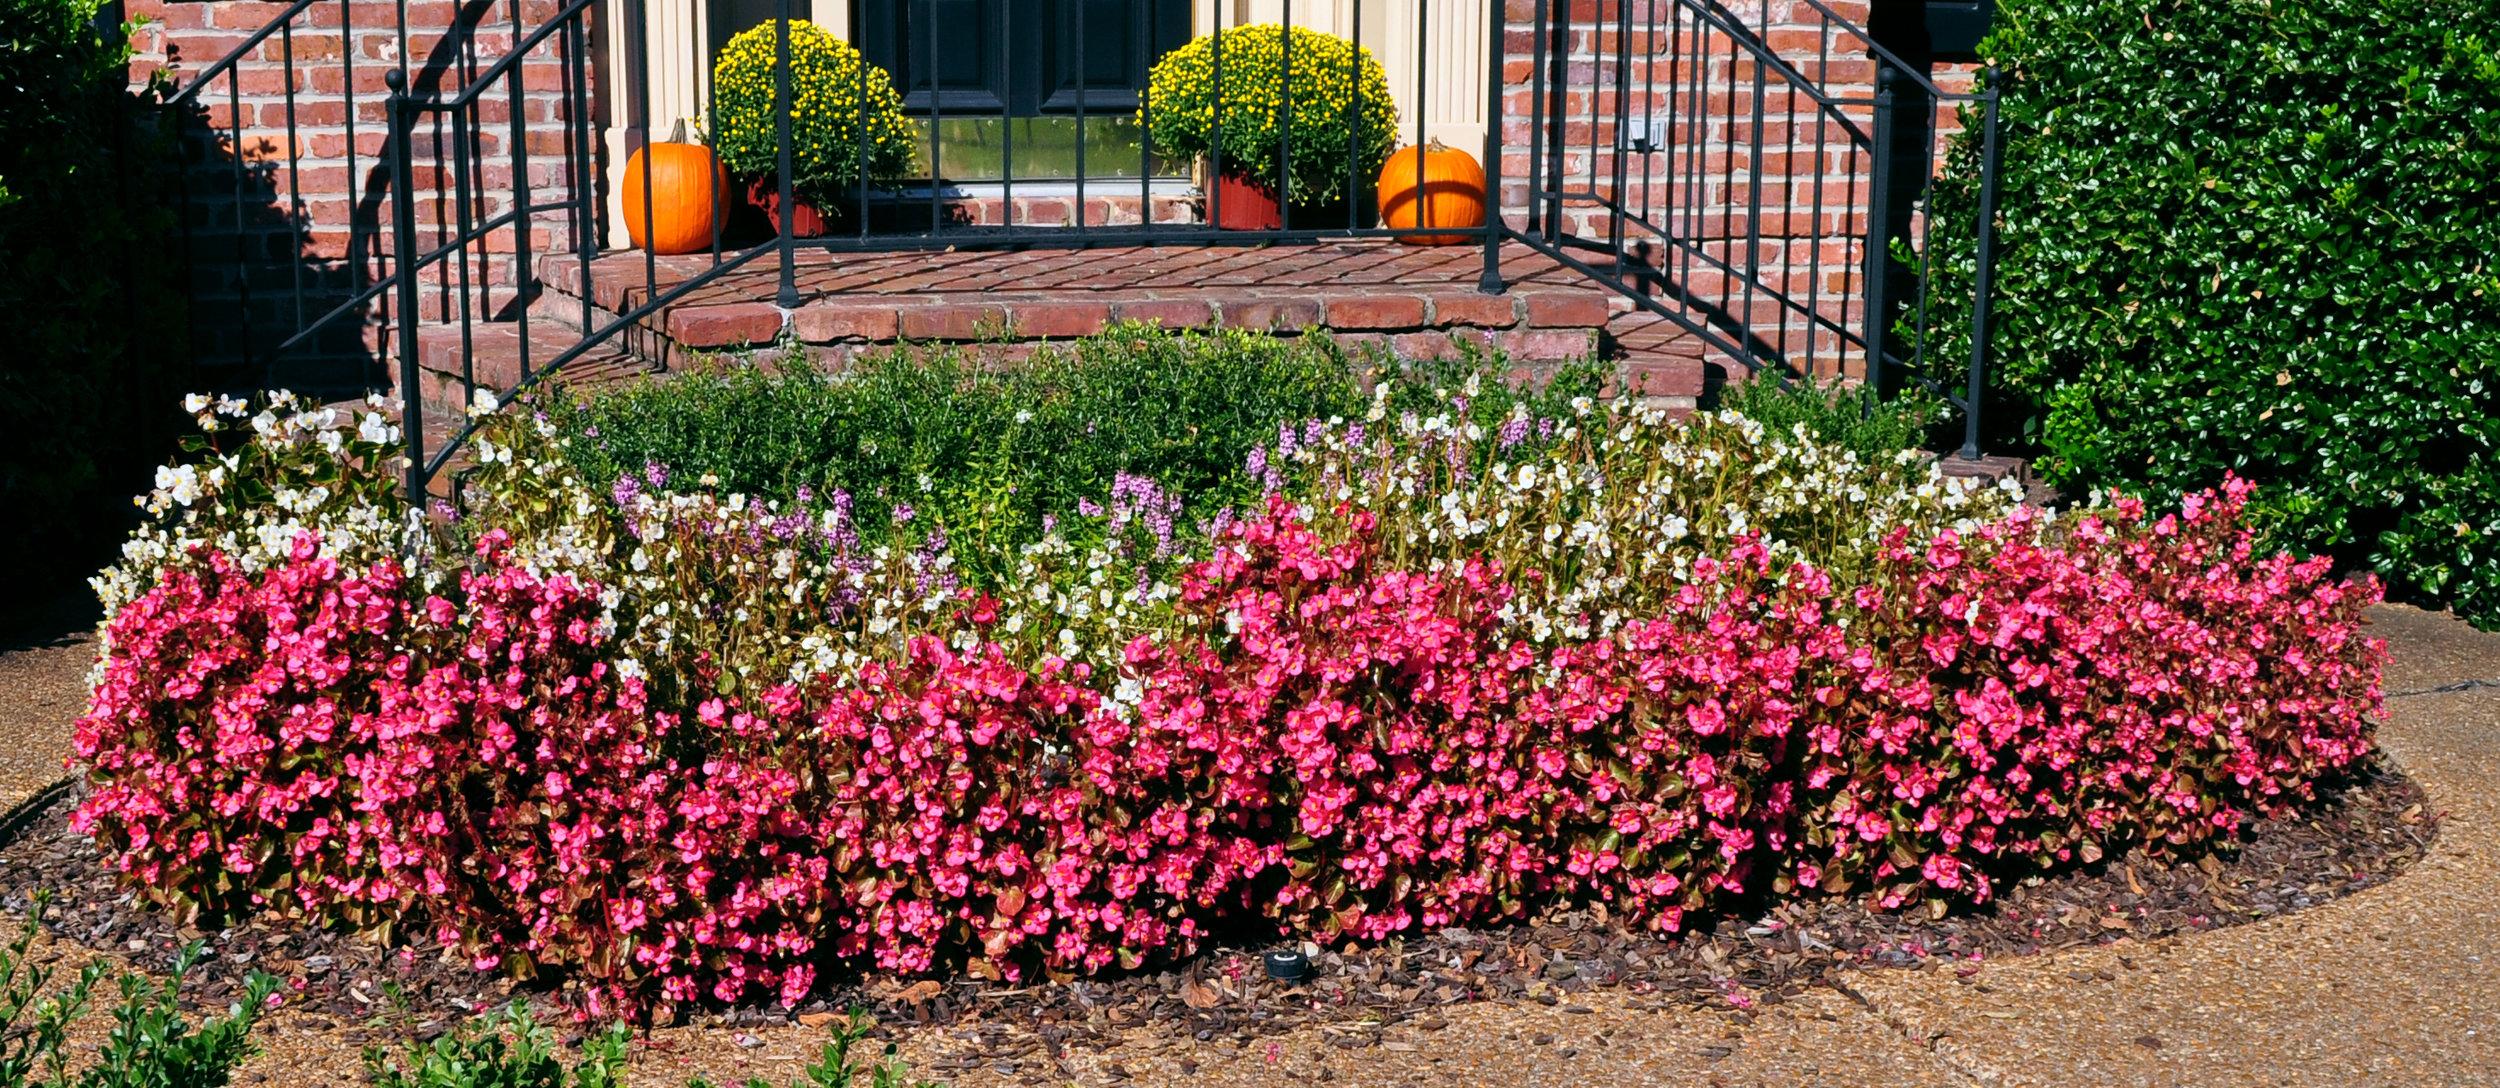 Mazza Spring Flowers 1.jpg